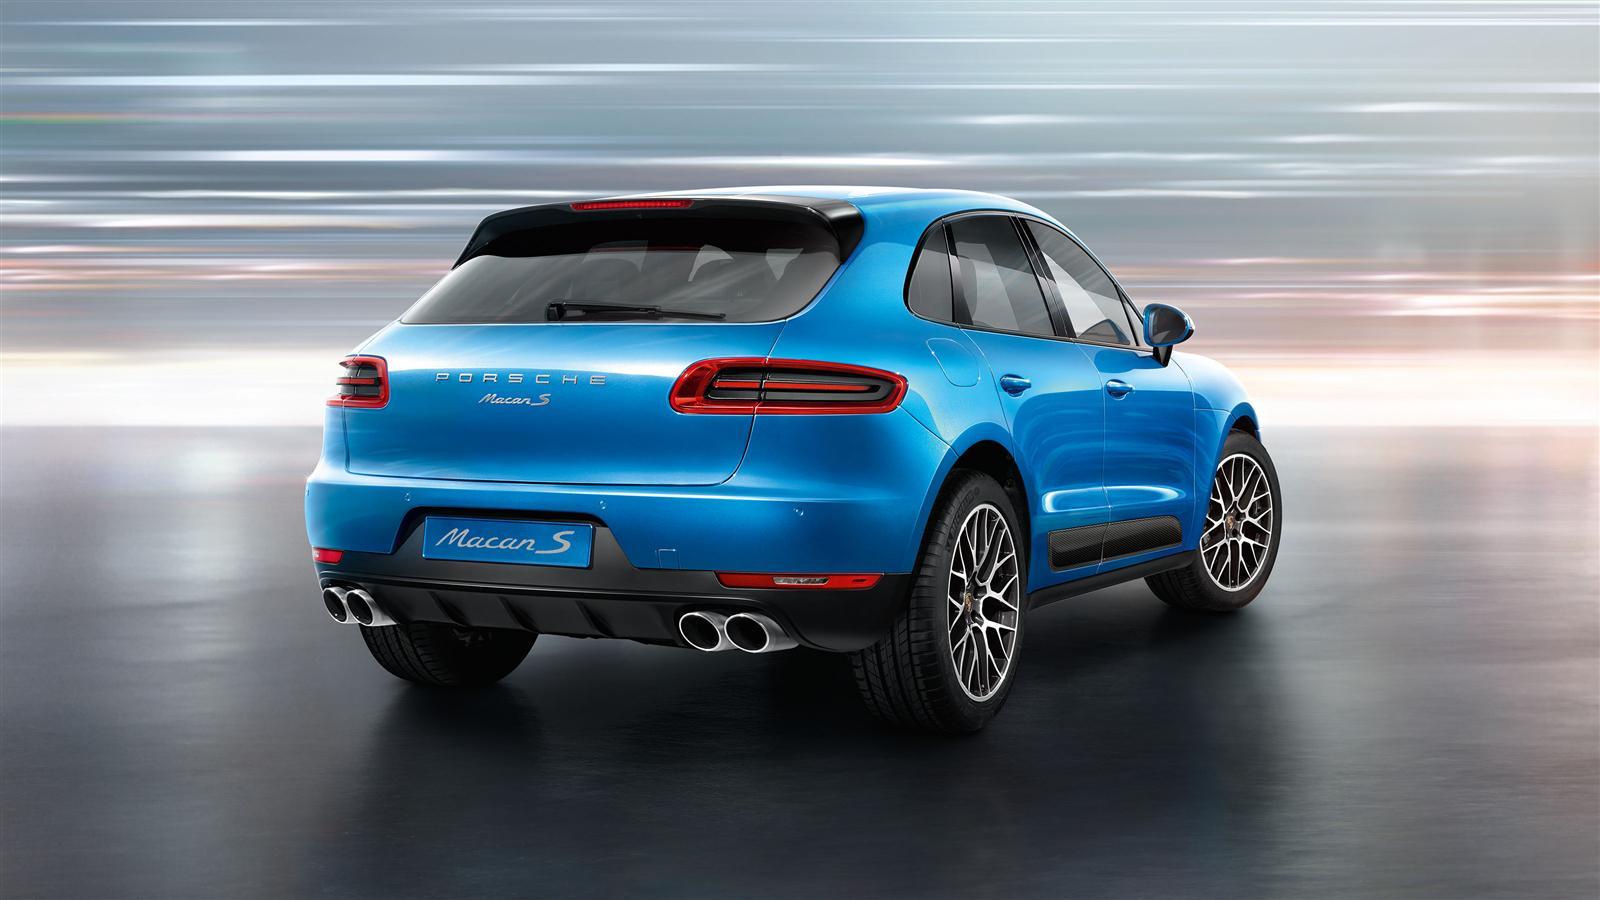 New Porsche Macan 2019 >> PORSCHE Macan S specs - 2014, 2015, 2016, 2017, 2018 - autoevolution